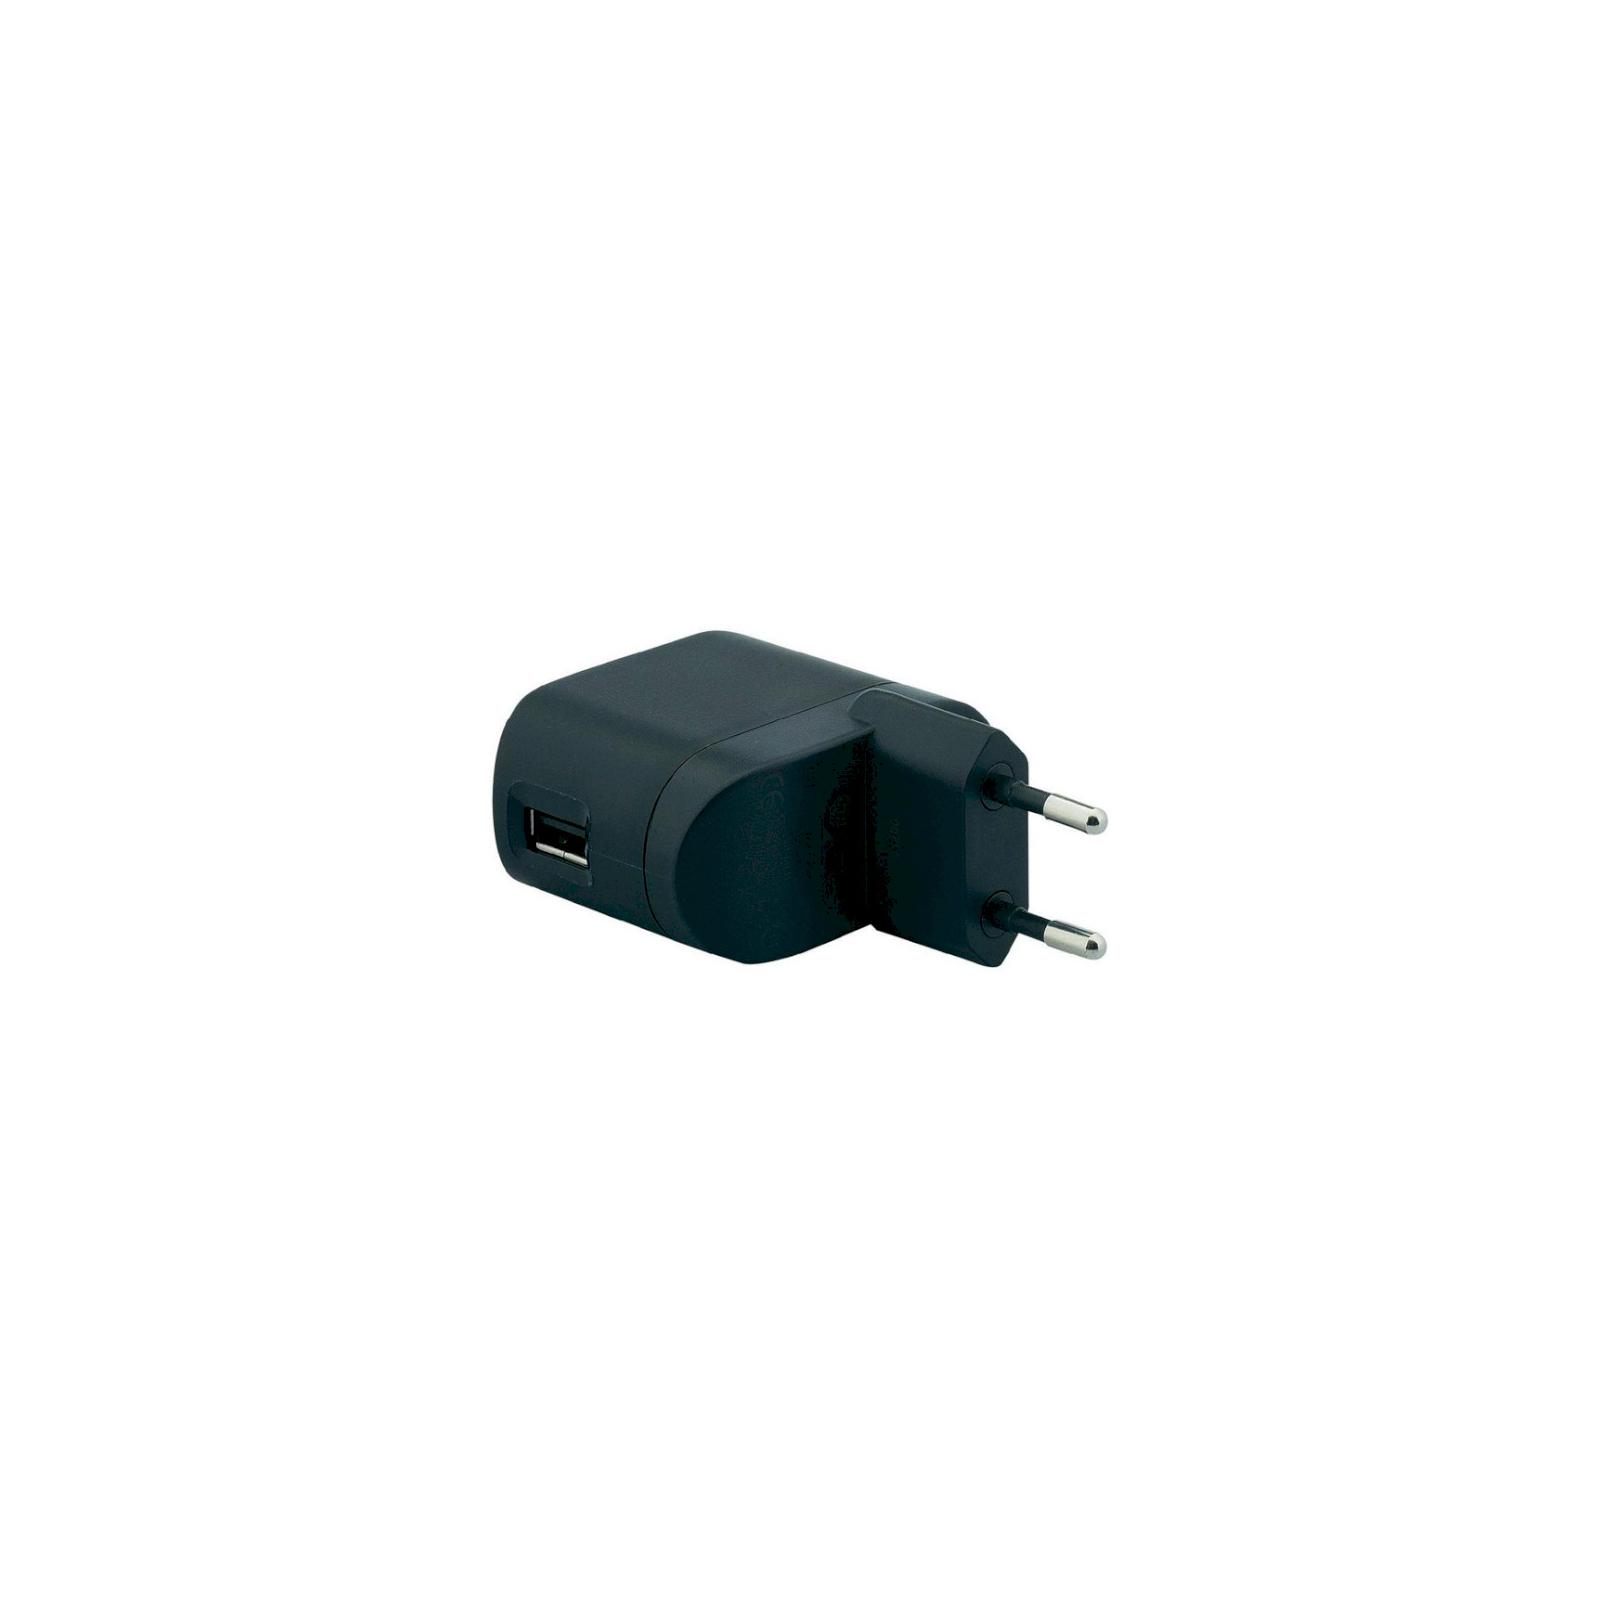 Зарядное устройство Belkin Wall Charger (F8Z563CWBLK)